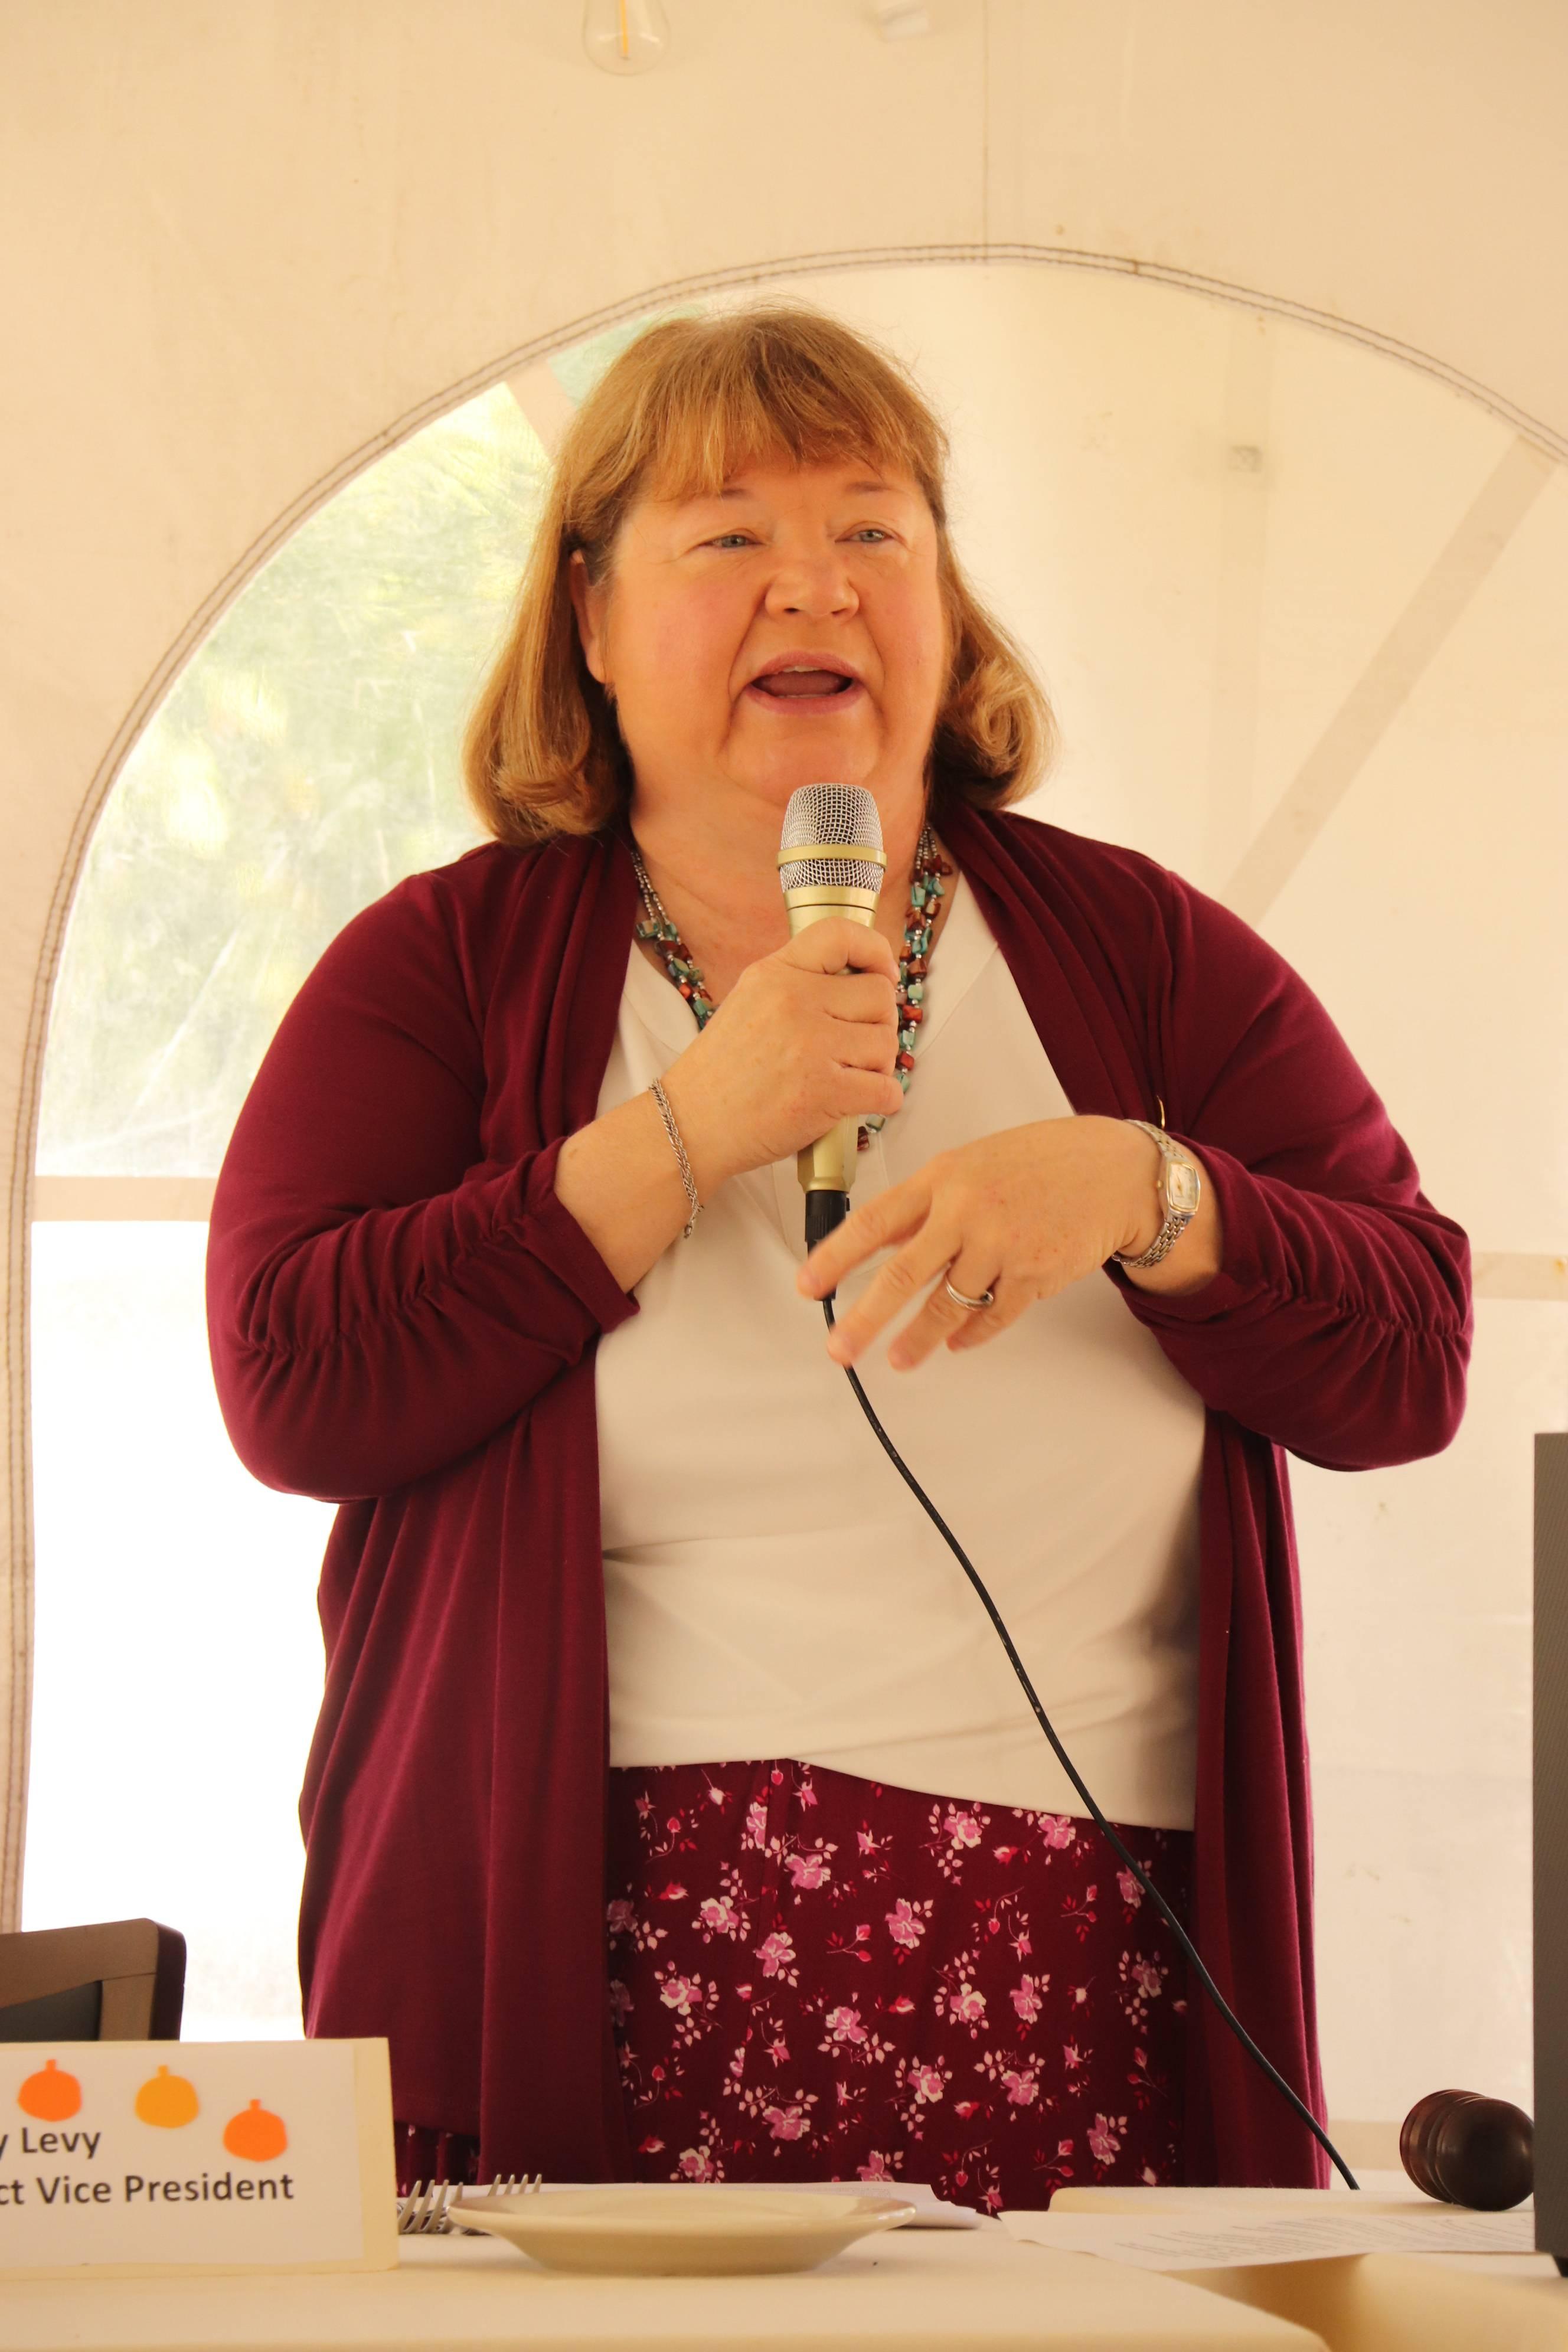 Nancy Levy